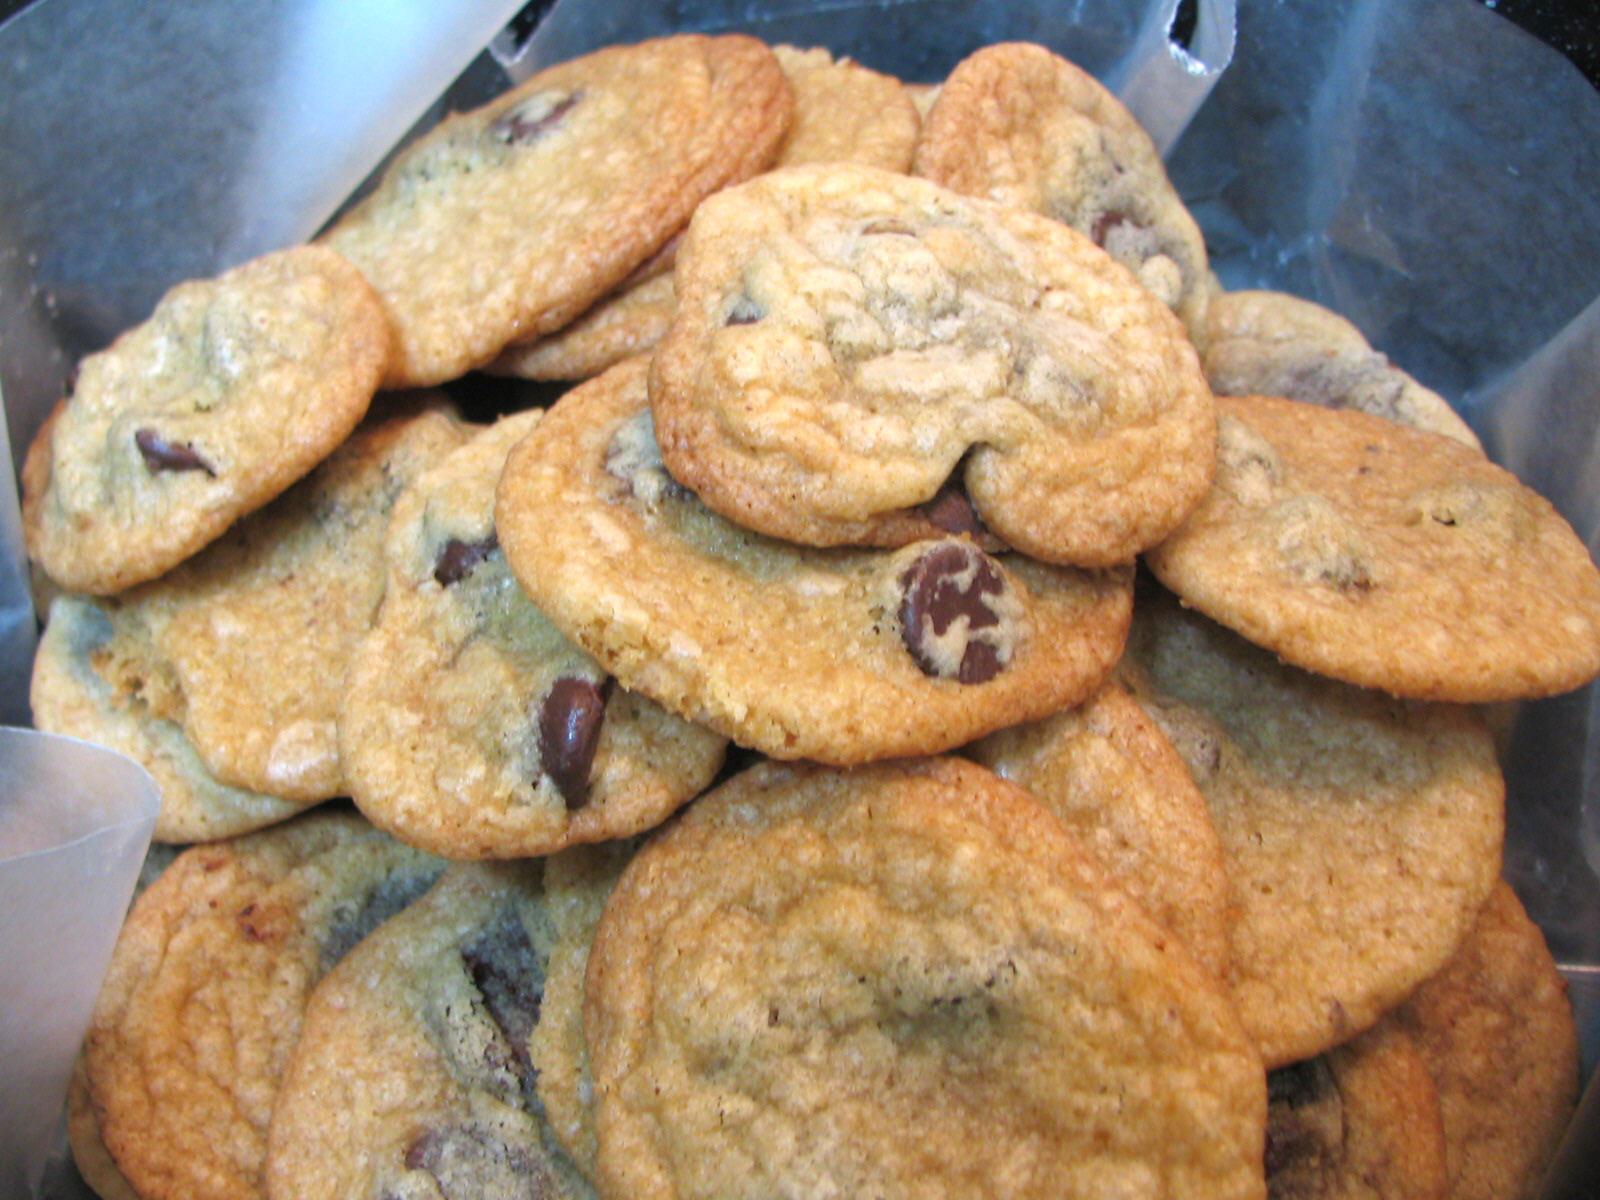 MENU LICIOUS: Crispy, Chewy, Freezer, Snacking Chocolate Chip Cookies